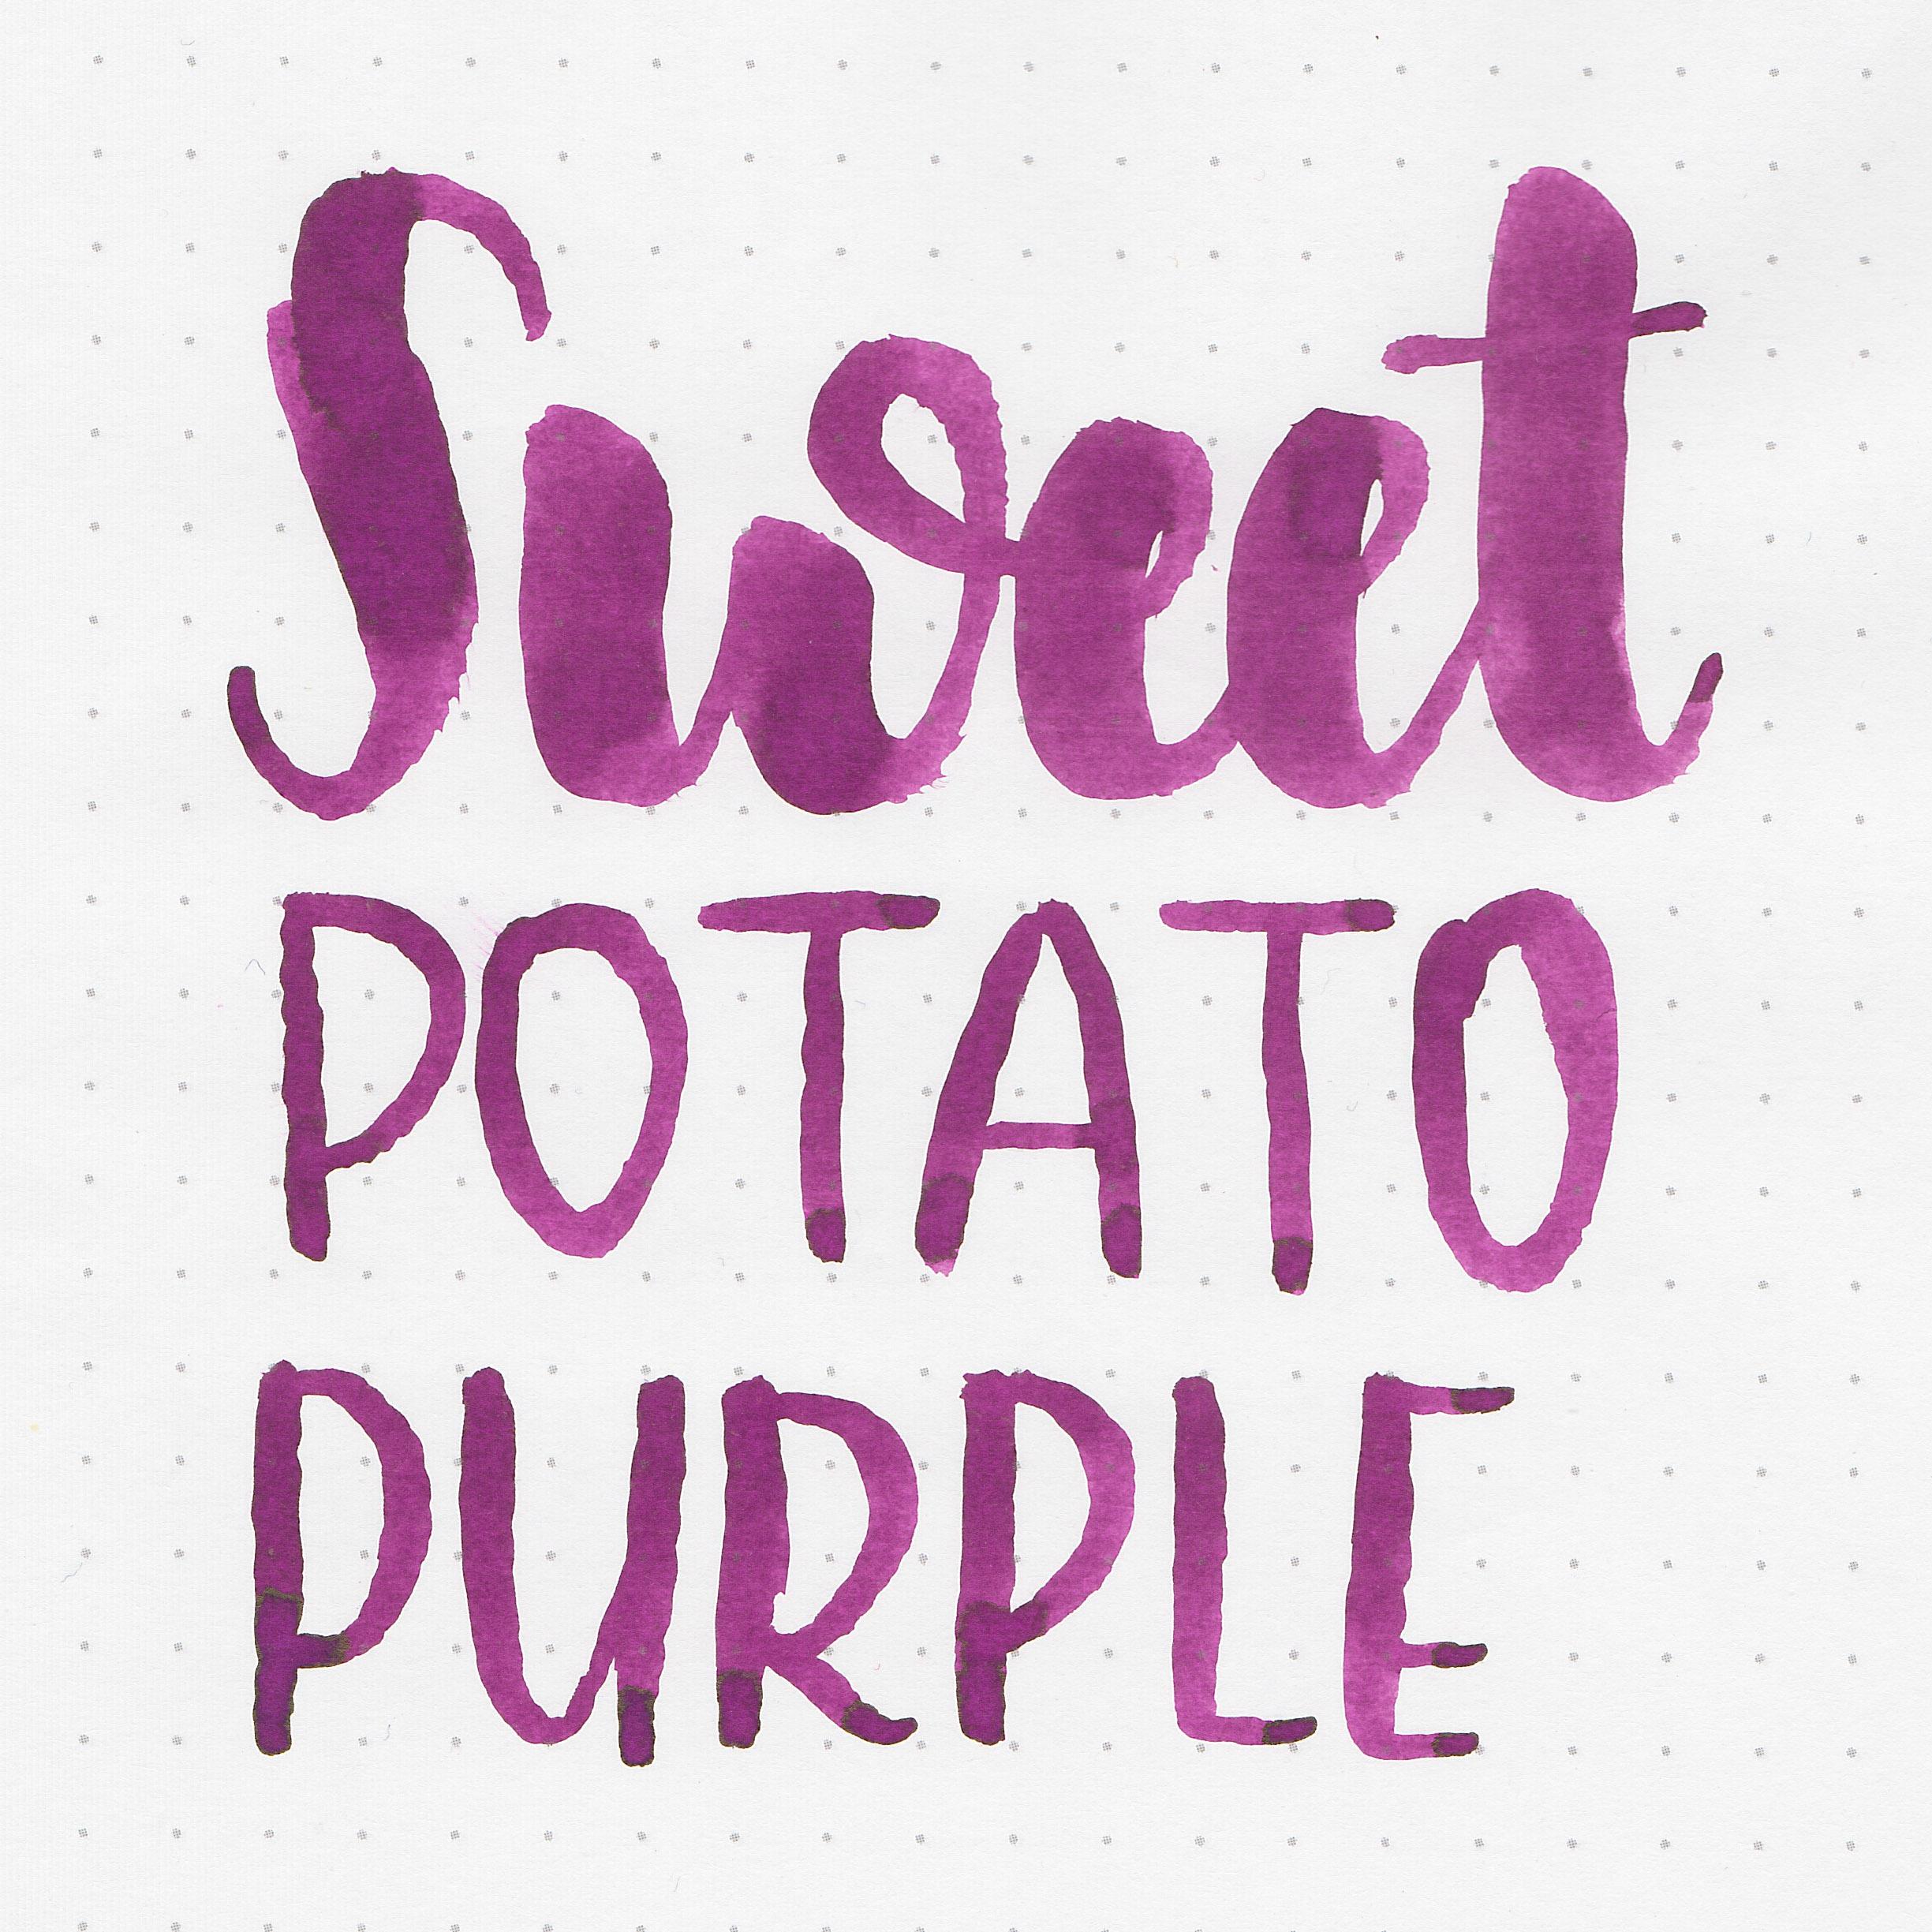 bb-sweet-potato-purple-4.jpg